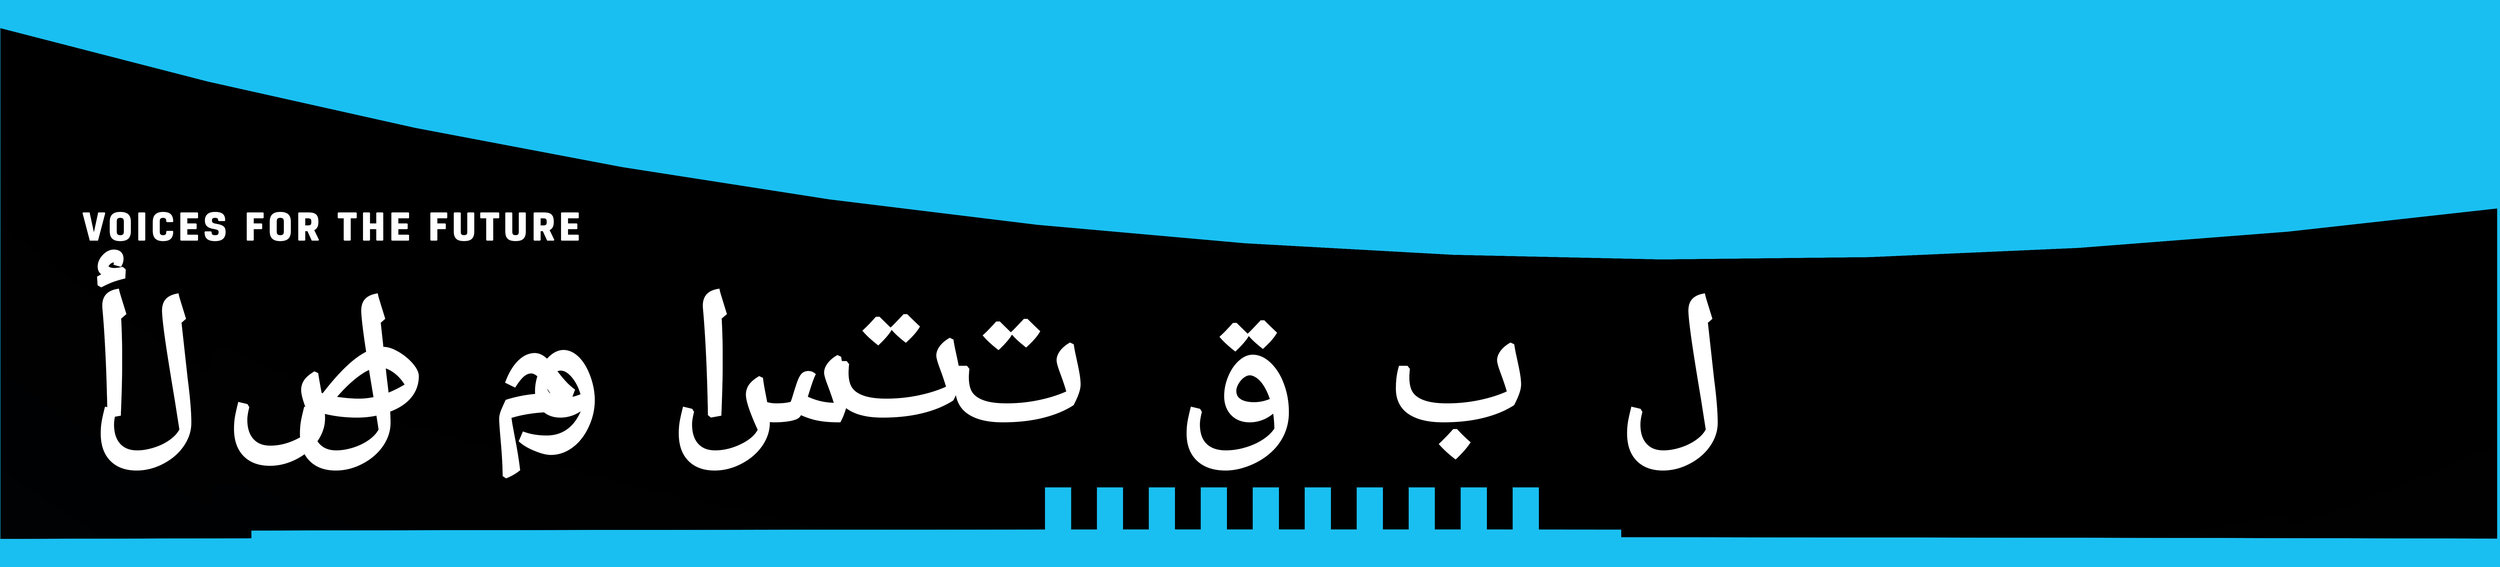 UN_NYC_VoicesOfTheFuture_Arabic.jpg